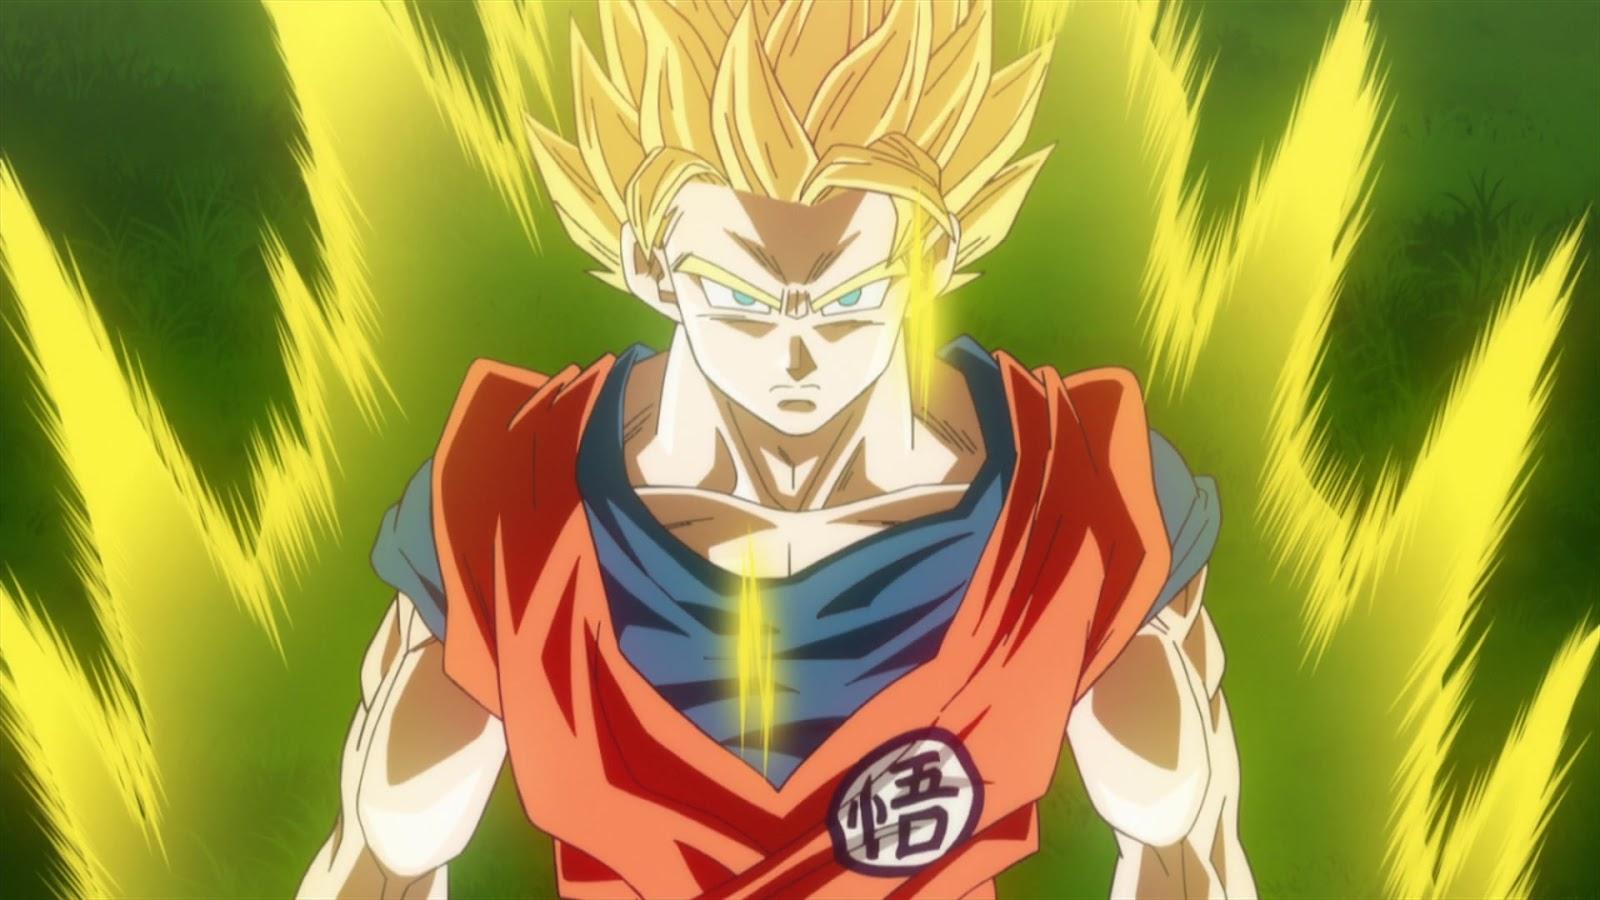 Dragon Ball Z Kai 1080p Mega Dragon.Ball.Z.Battle.Of.Gods.2013.1080p.BluRay.DTS.x264-PublicHD+060